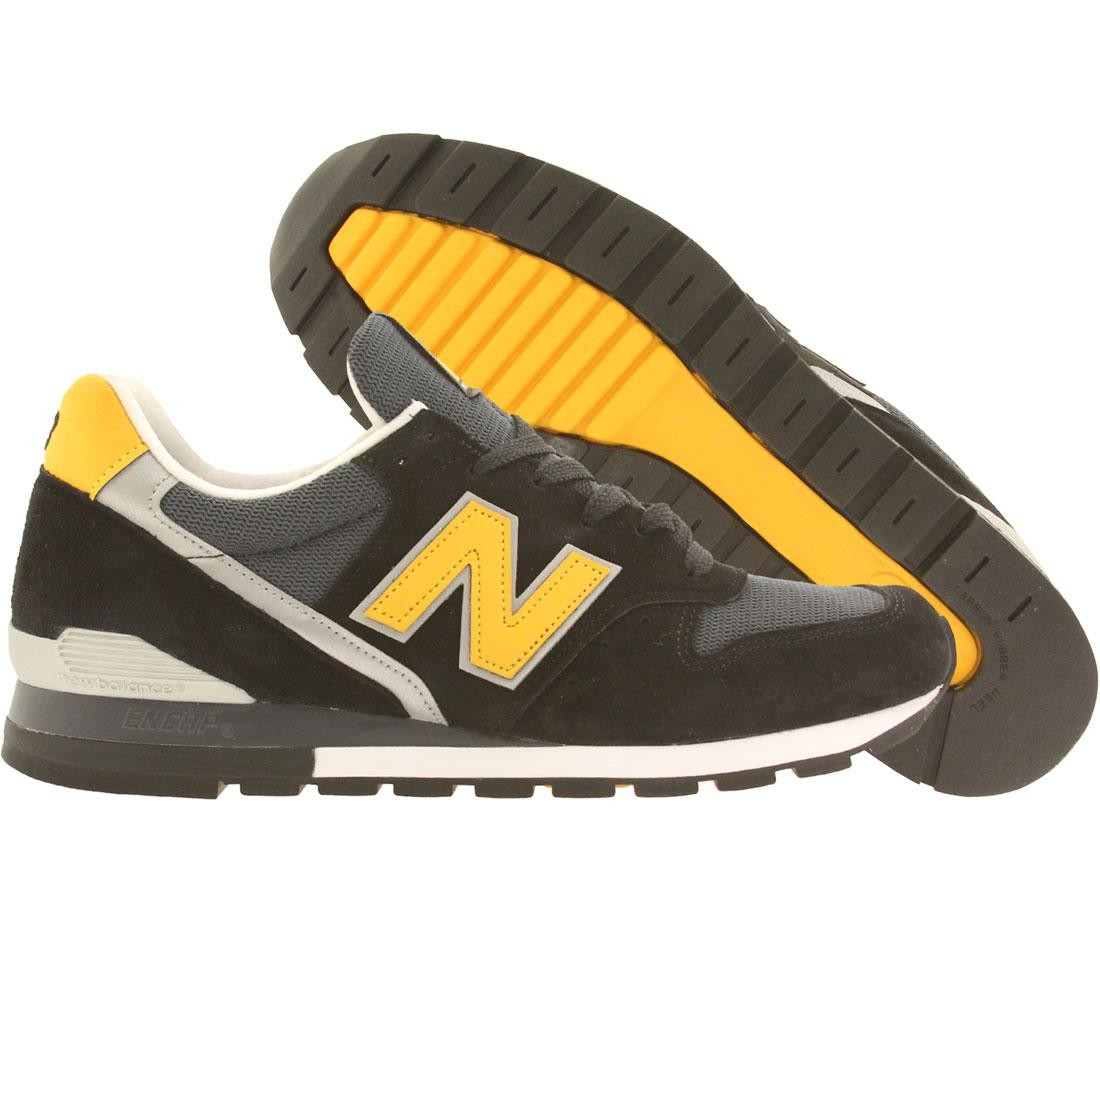 online store 6d1d5 e8f63 New Balance Men 996 Connoisseur Ski M996CSMI - Made In USA (black / yellow  / silver)